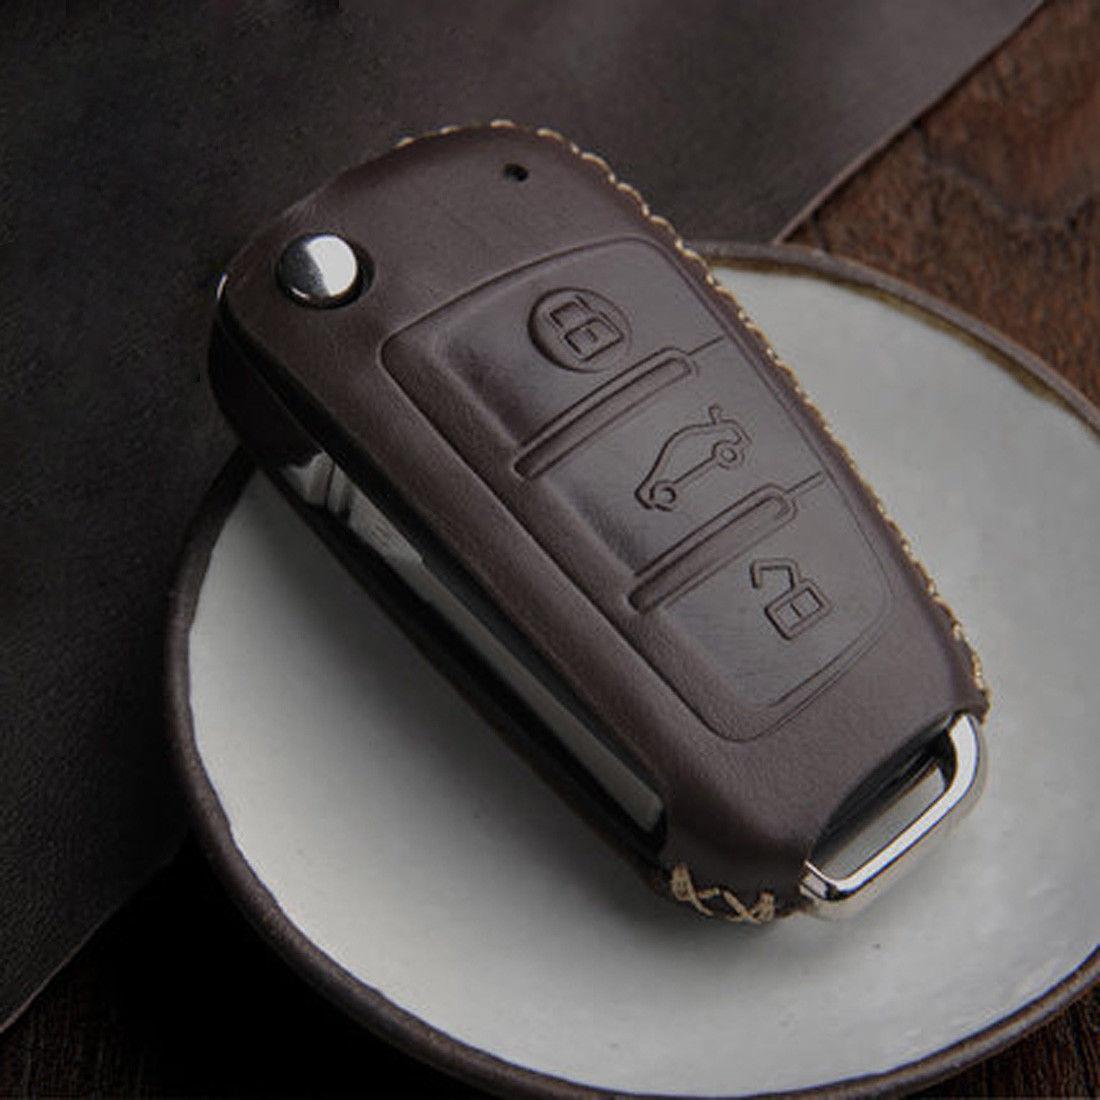 Кожаный чехол для ключа Audi A1,A3,A4,A5,A6,A6 ALLROAD QUATTRO,A7,A8,Q2,Q3,Q5,Q7,Q8,R8,RS Q3,RS3,RS4,RS5